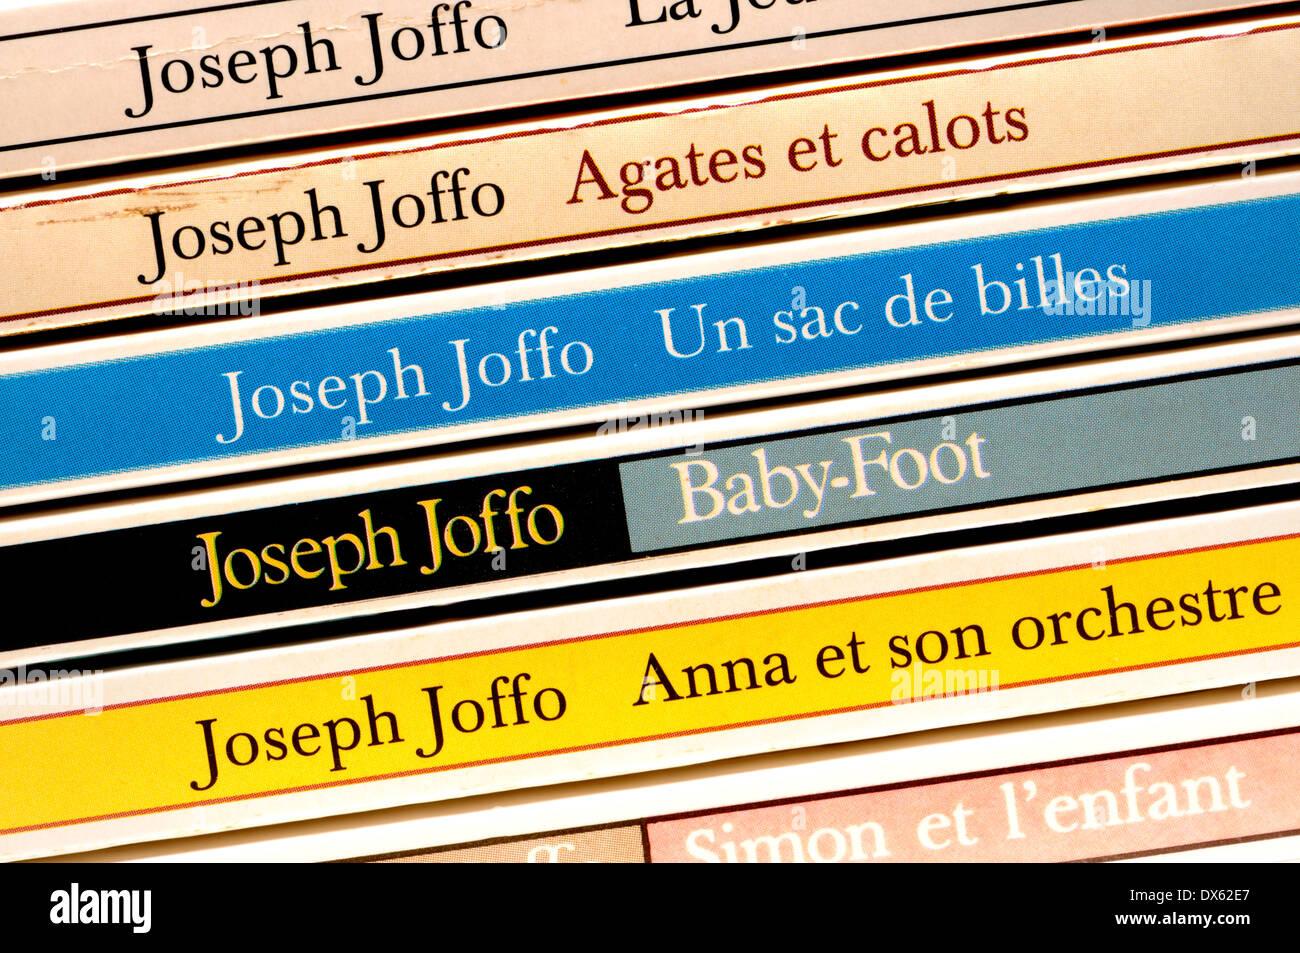 Joseph Joffo French paperback novels - Stock Image